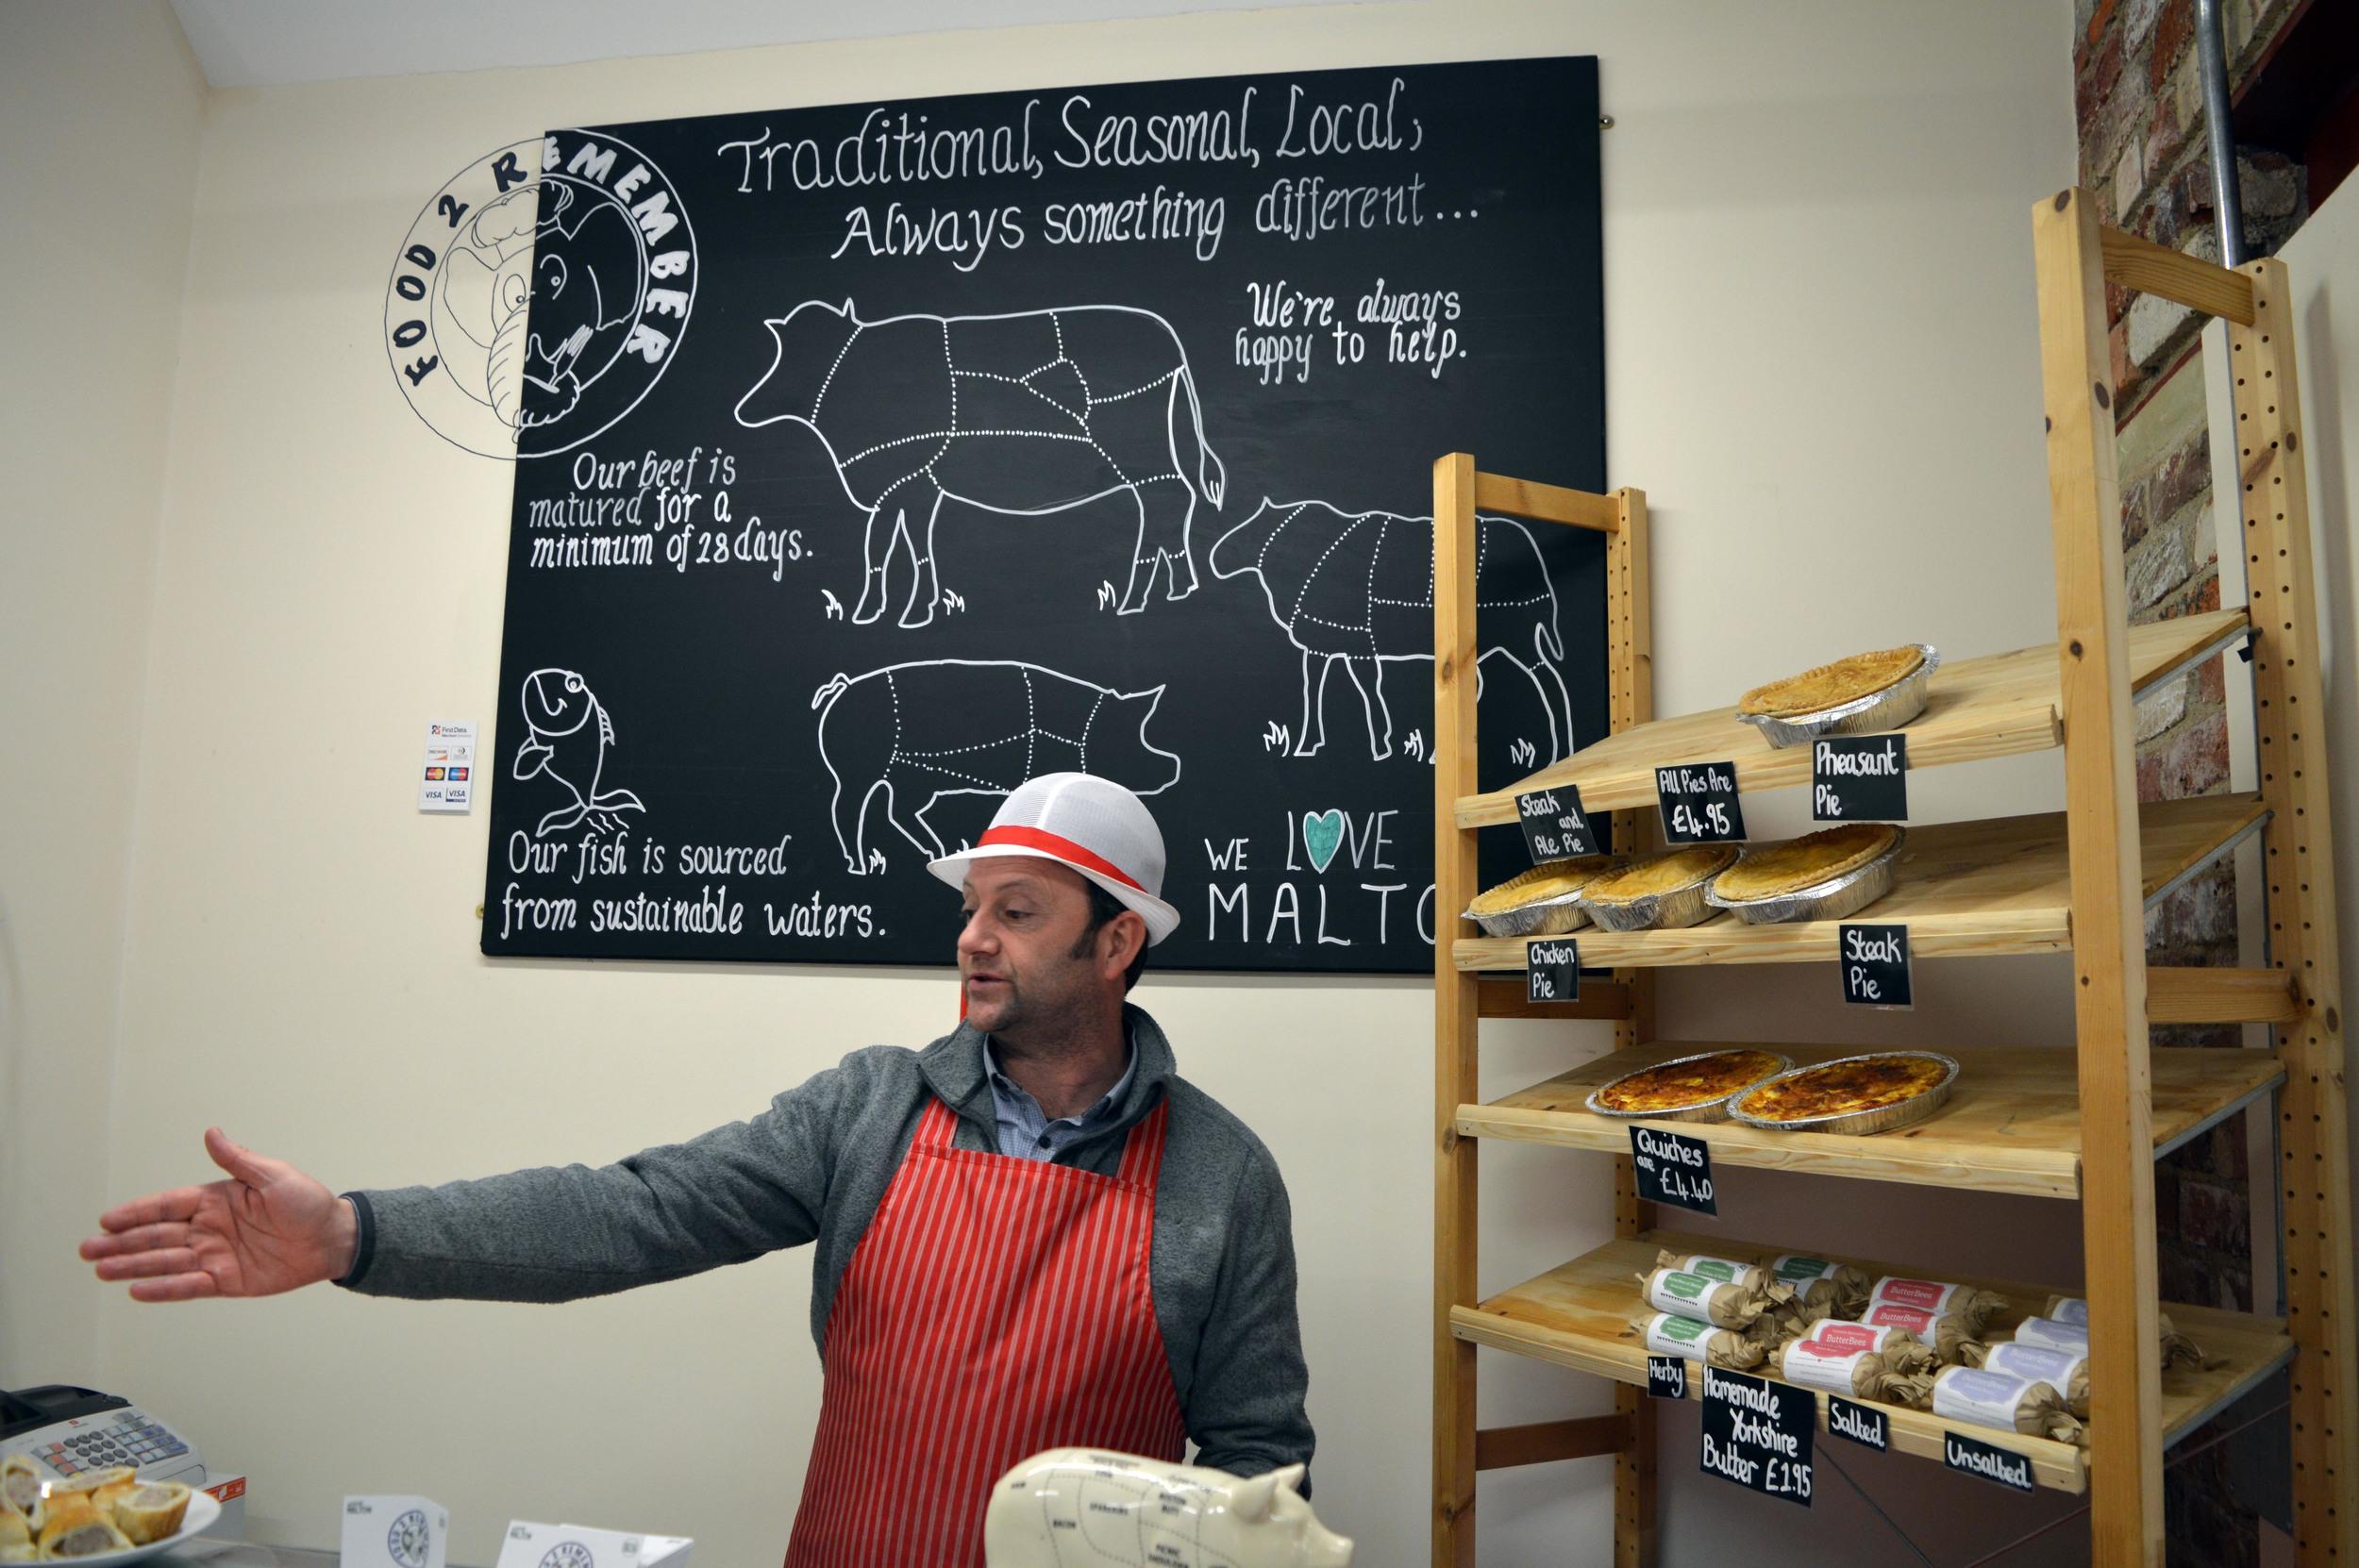 Paul Pott's butchery - Food 2 Remember